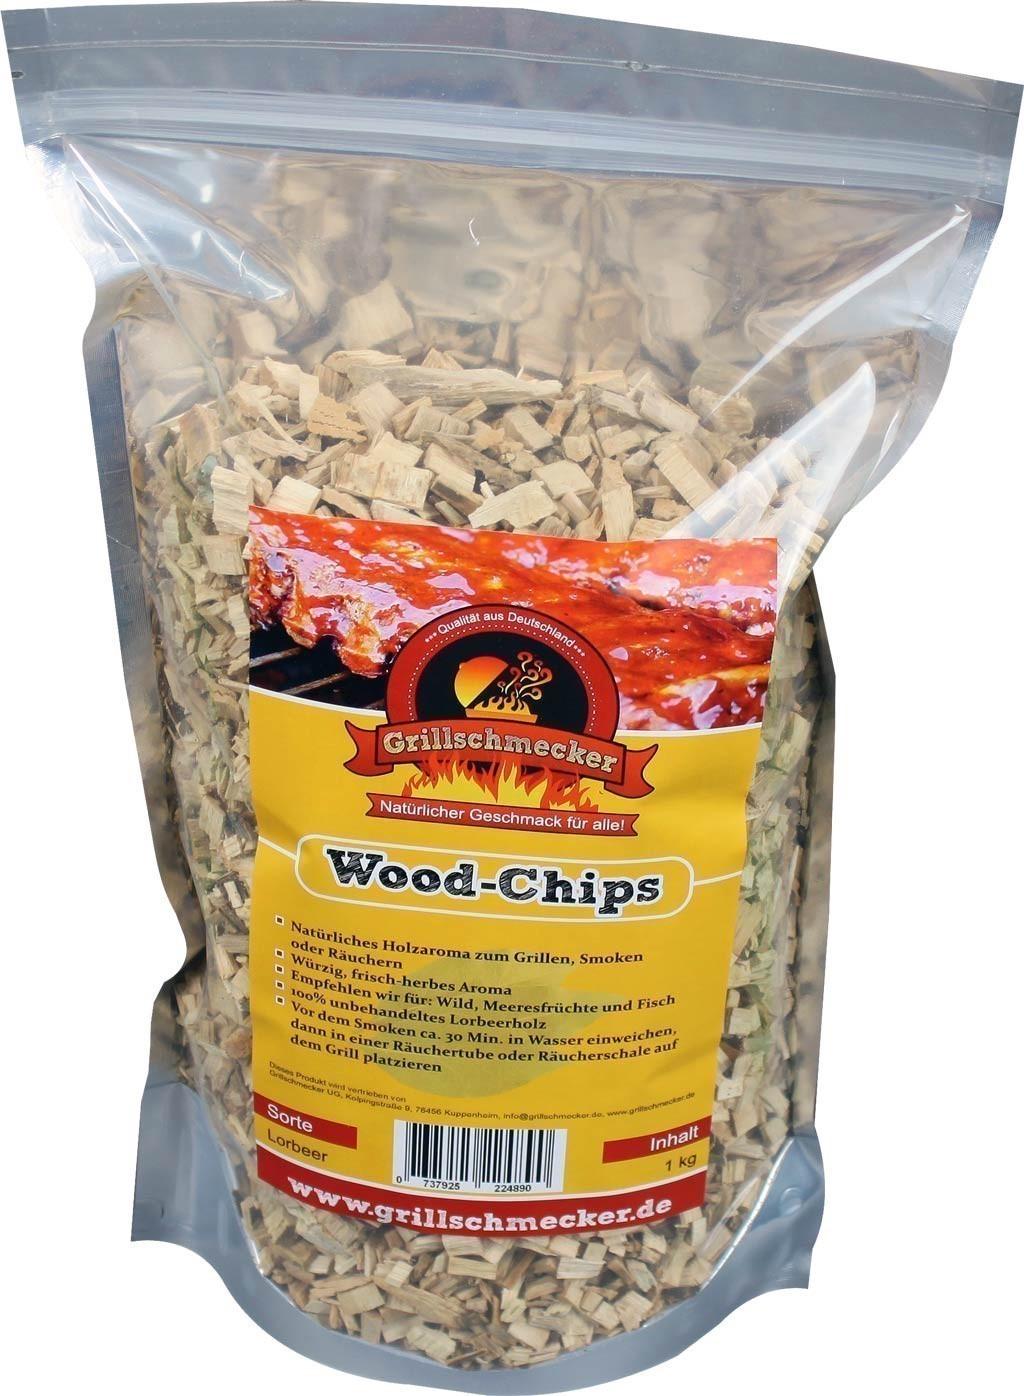 Räucherholz Wood-Chips Lorbeer 1kg Bild 1